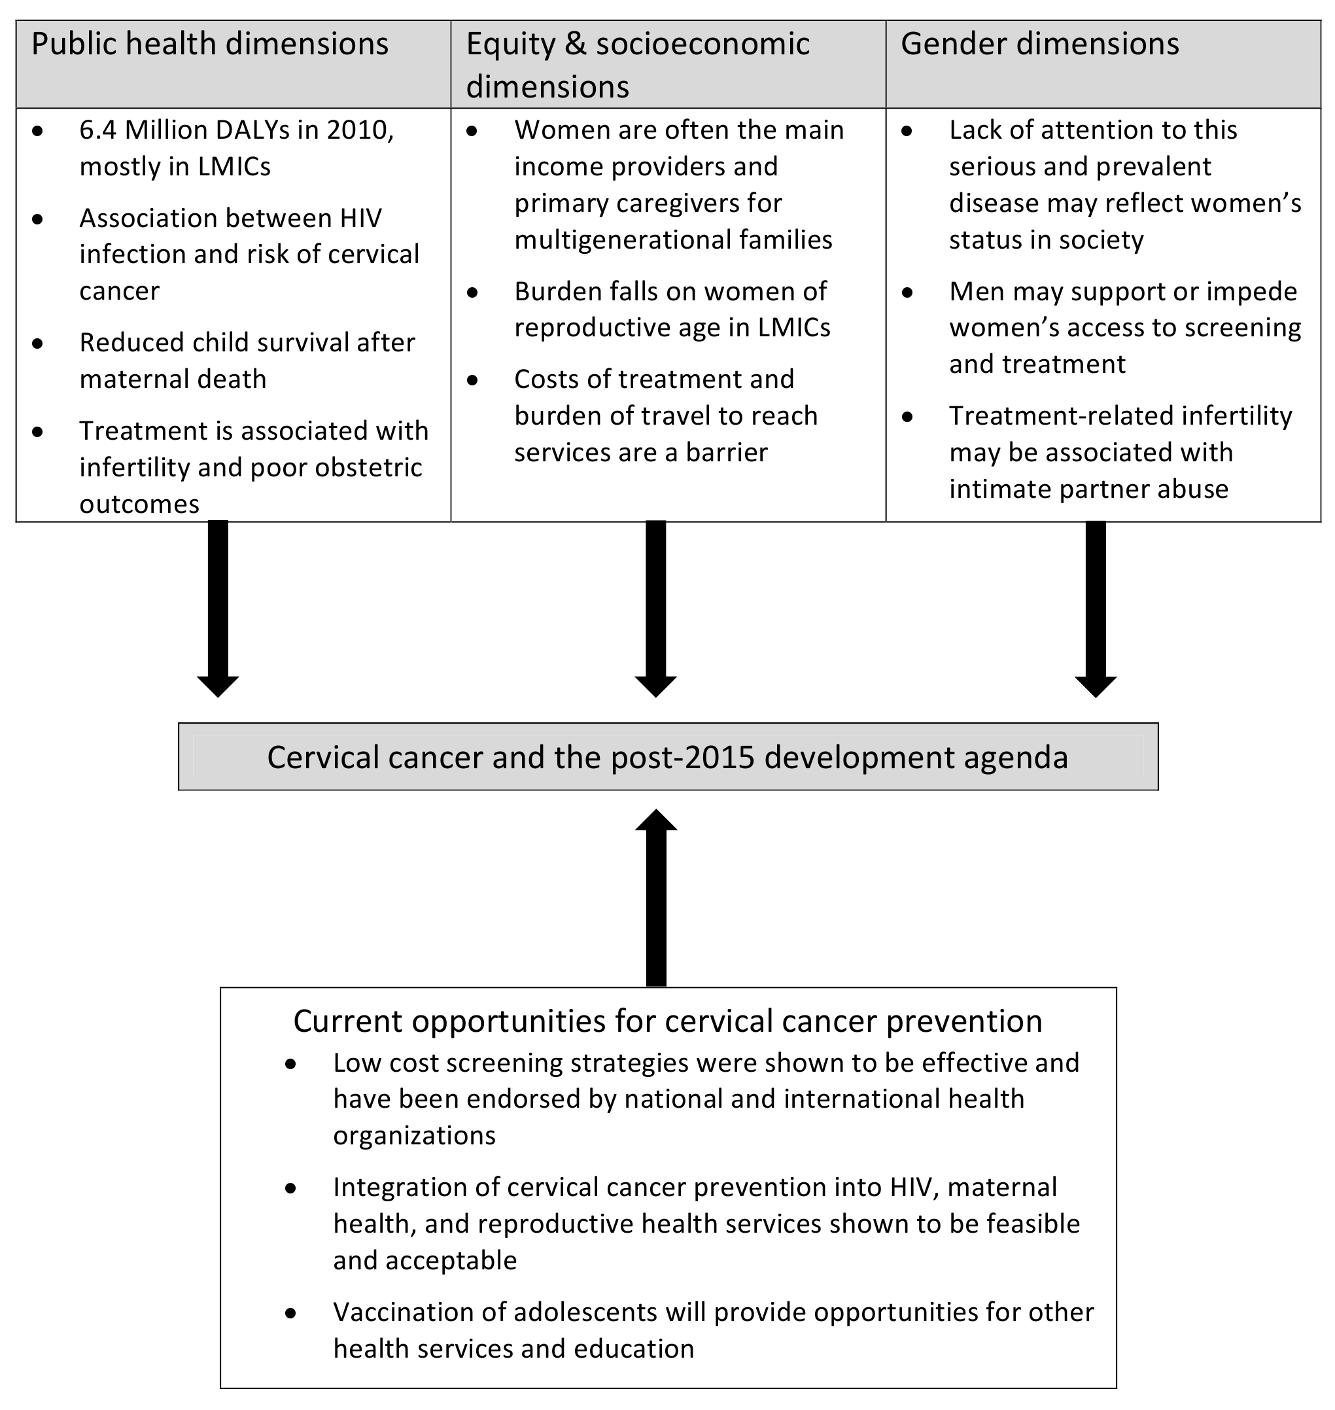 Cervical cancer and the post-2015 agenda: a multidimensional framework.